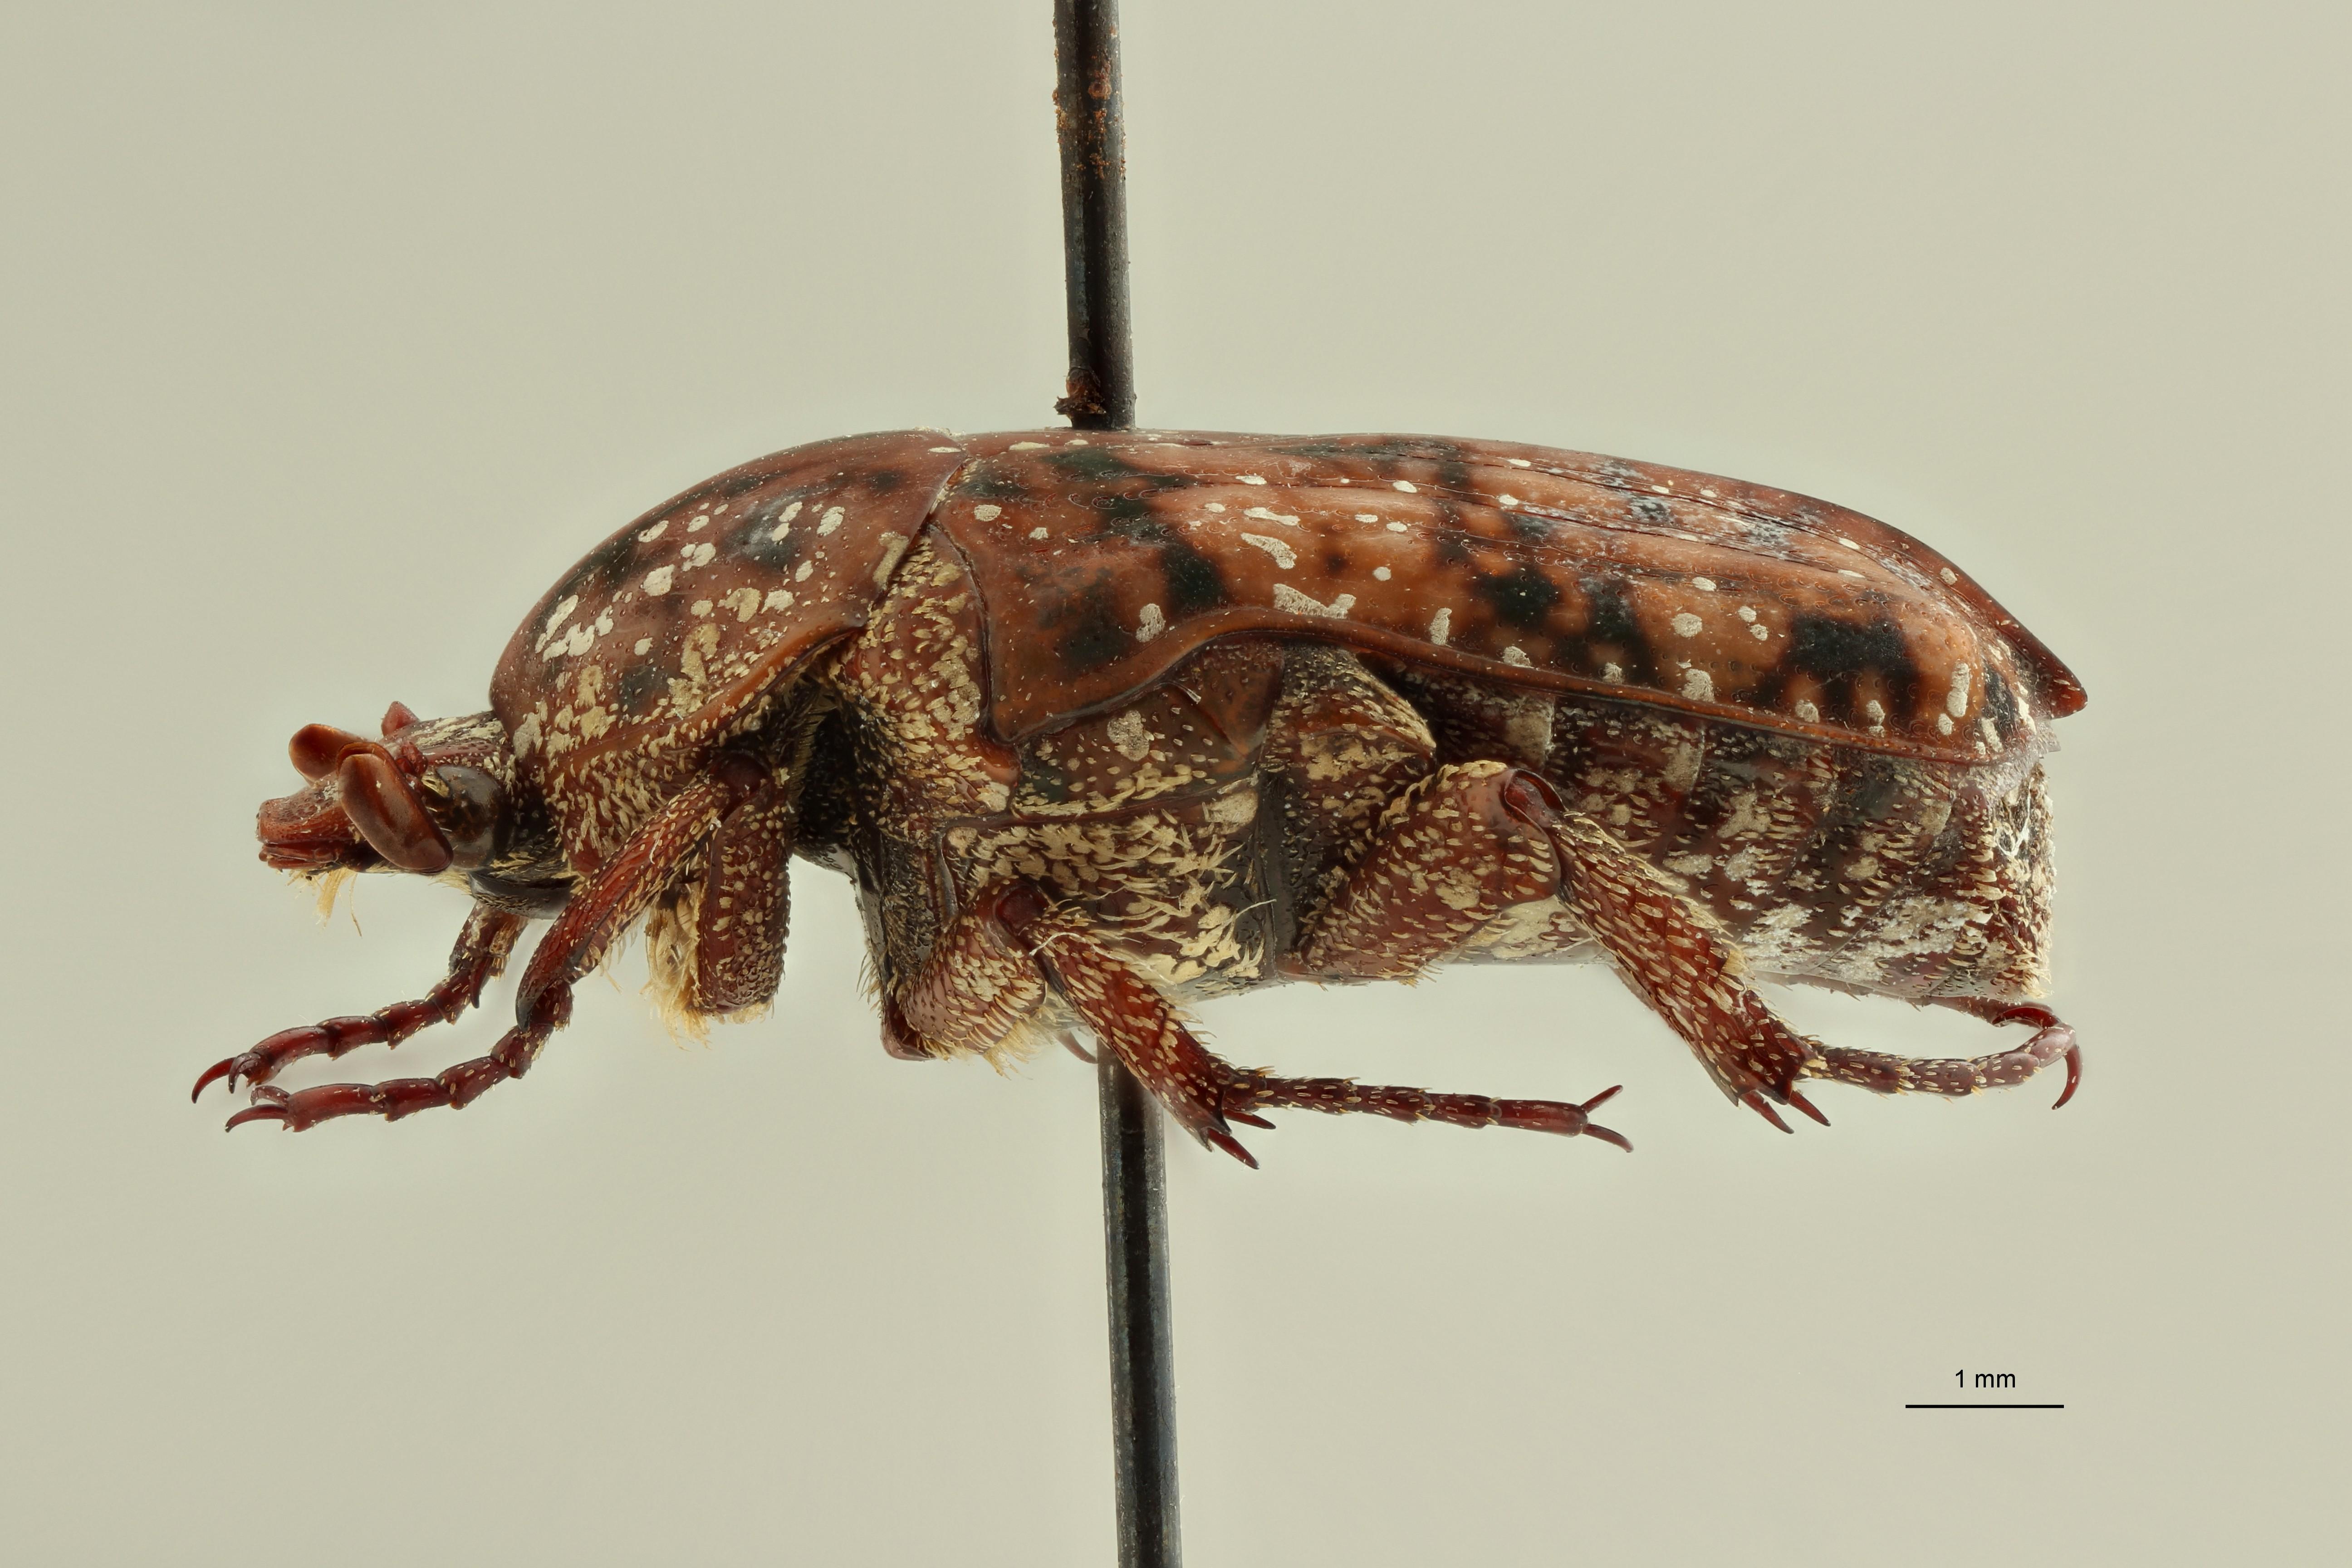 Atrichelaphinis (Eugeaphinis) deplanata minettii pt1 L ZS PMax Scaled.jpeg